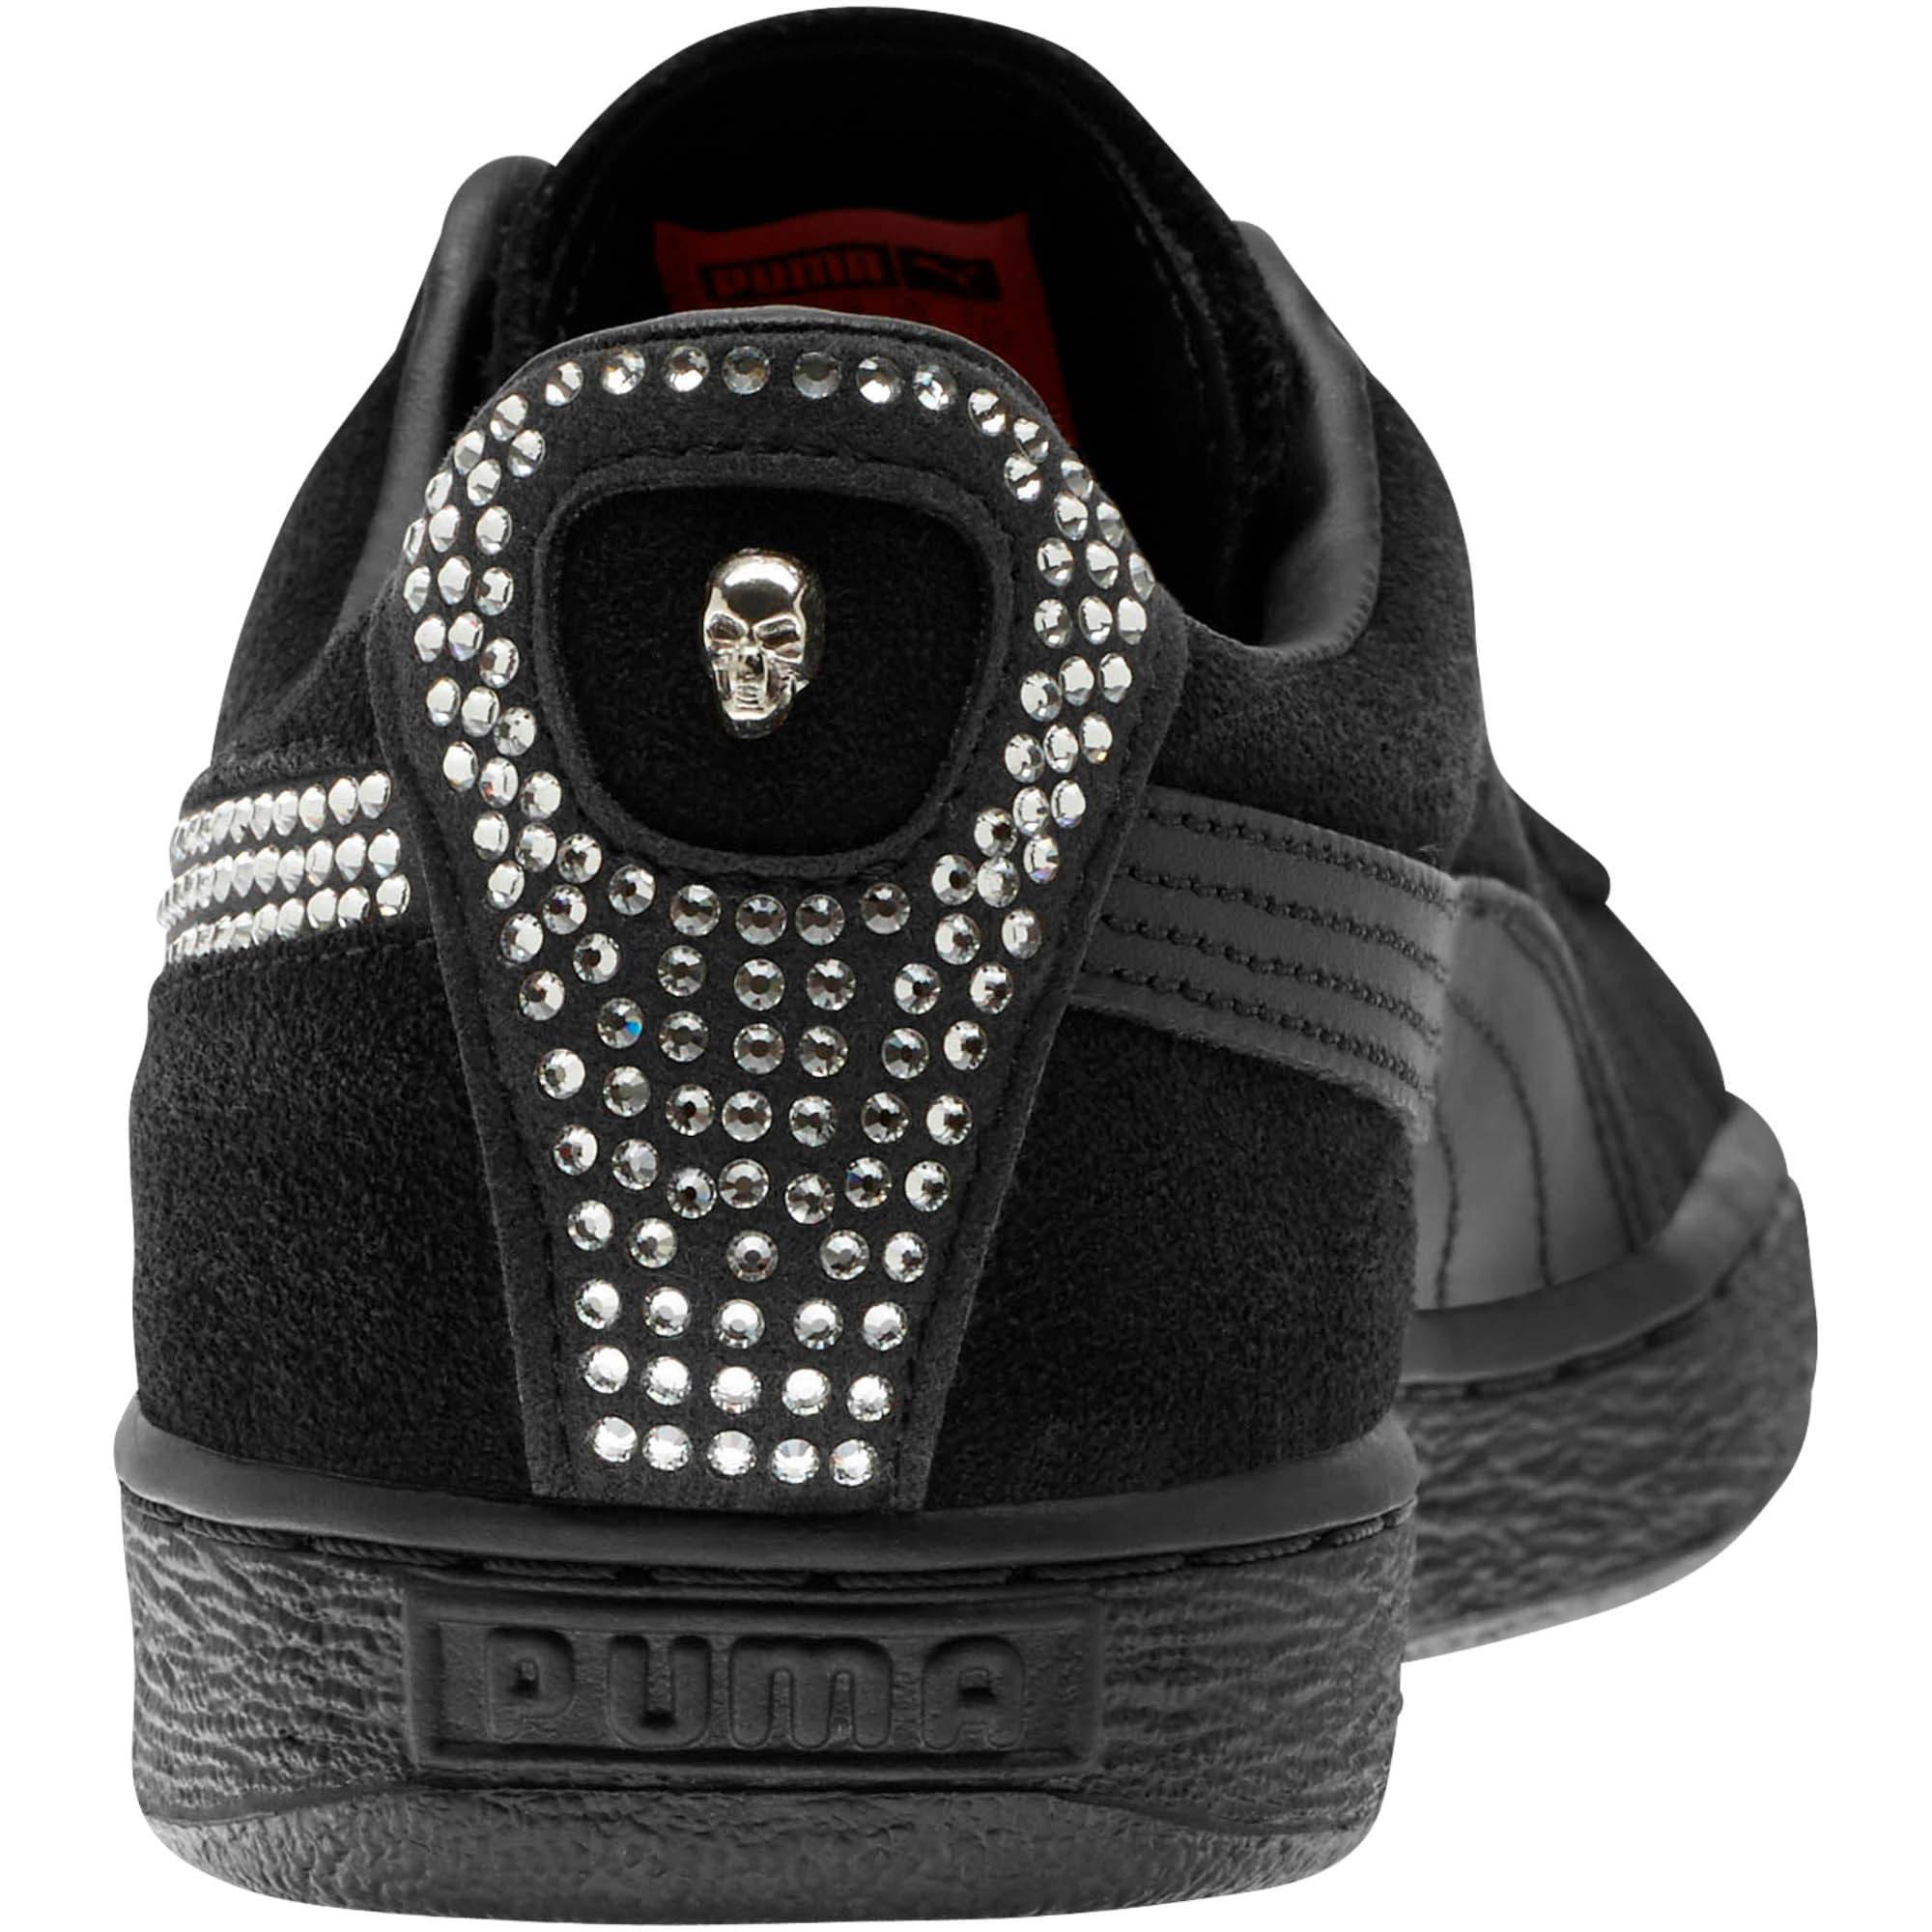 Miniatura 3 de Zapatos deportivos de gamuza PUMA x THE KOOPLES, Puma Black, mediano